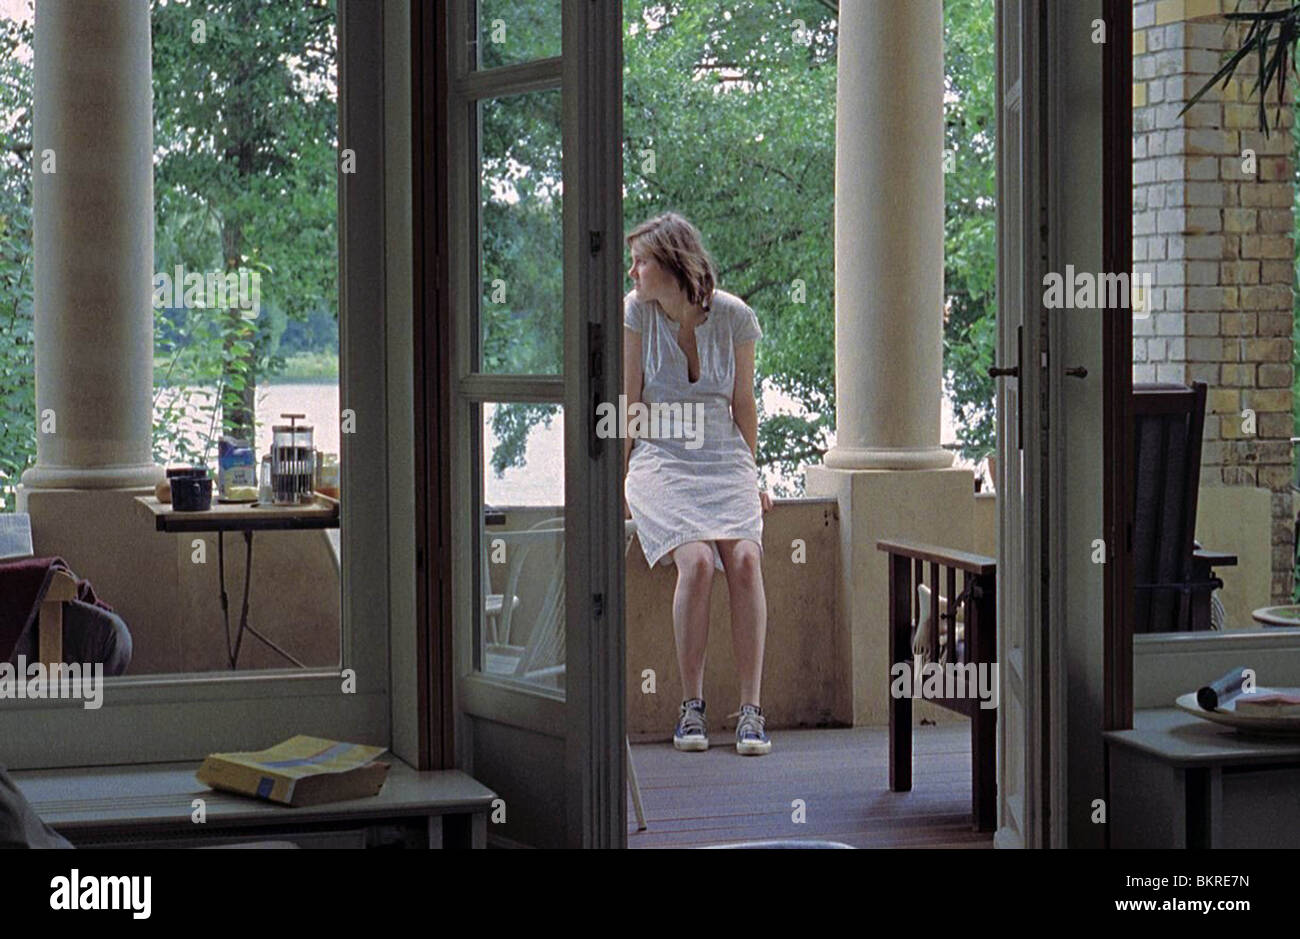 NACHMITTAG (2007) AFTERNOON (ALT) ANGELA SCHANELEC (DIR) 001 - Stock Image